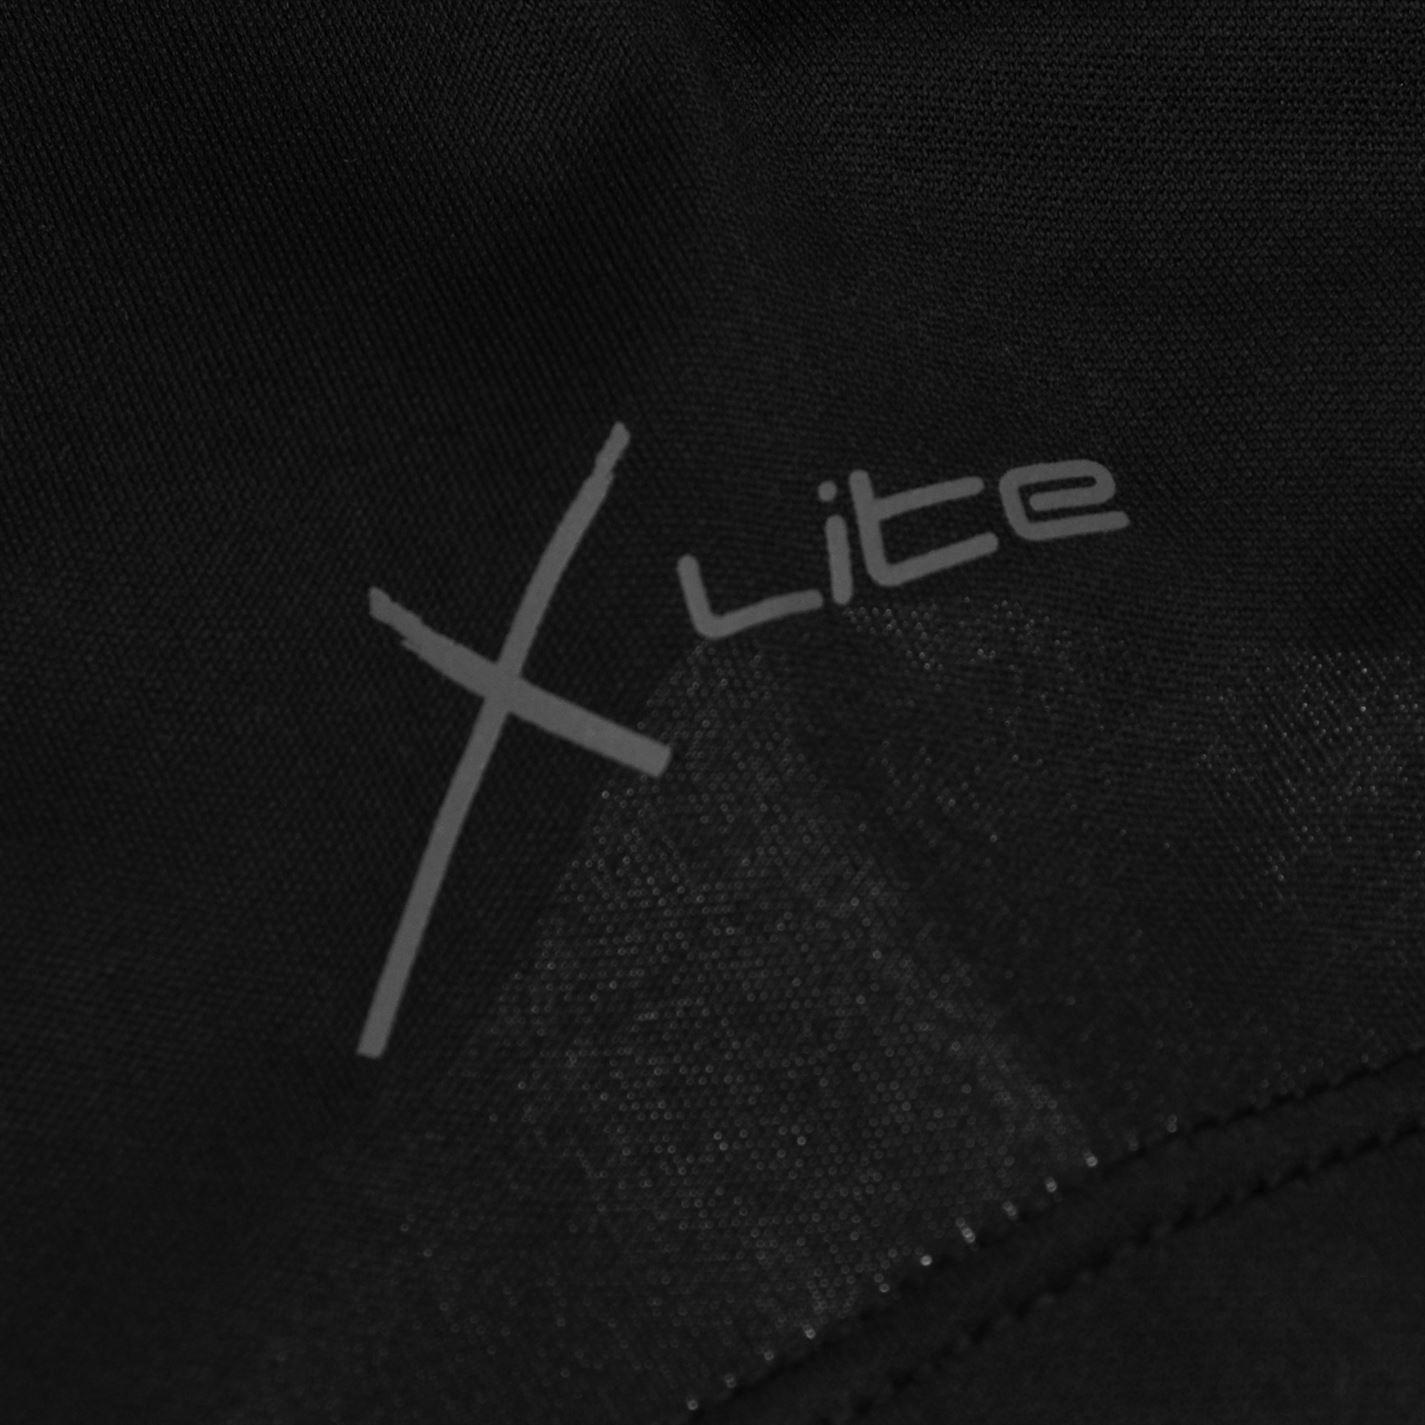 Karrimor-Hombres-X-Lite-Camiseta-mangas-cortas-de-carrera-Rendimiento-Camiseta-Top-Cuello-Redondo miniatura 16